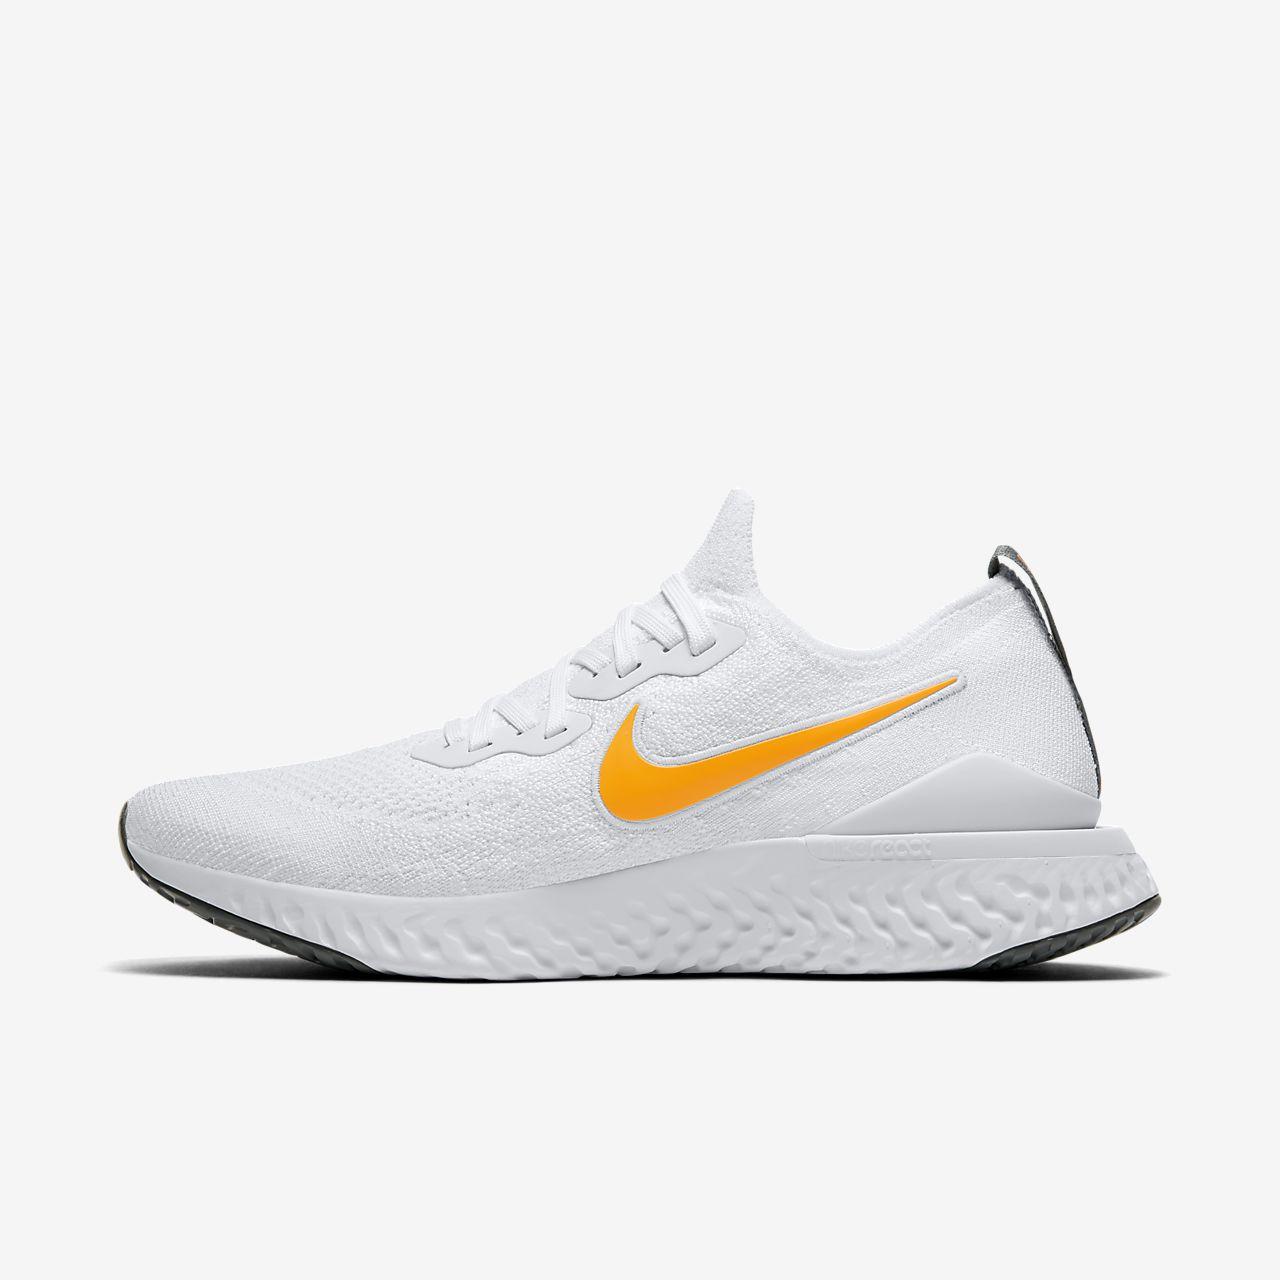 official photos ee701 8a0fa Nike Epic React Flyknit 2 Men's Running Shoe